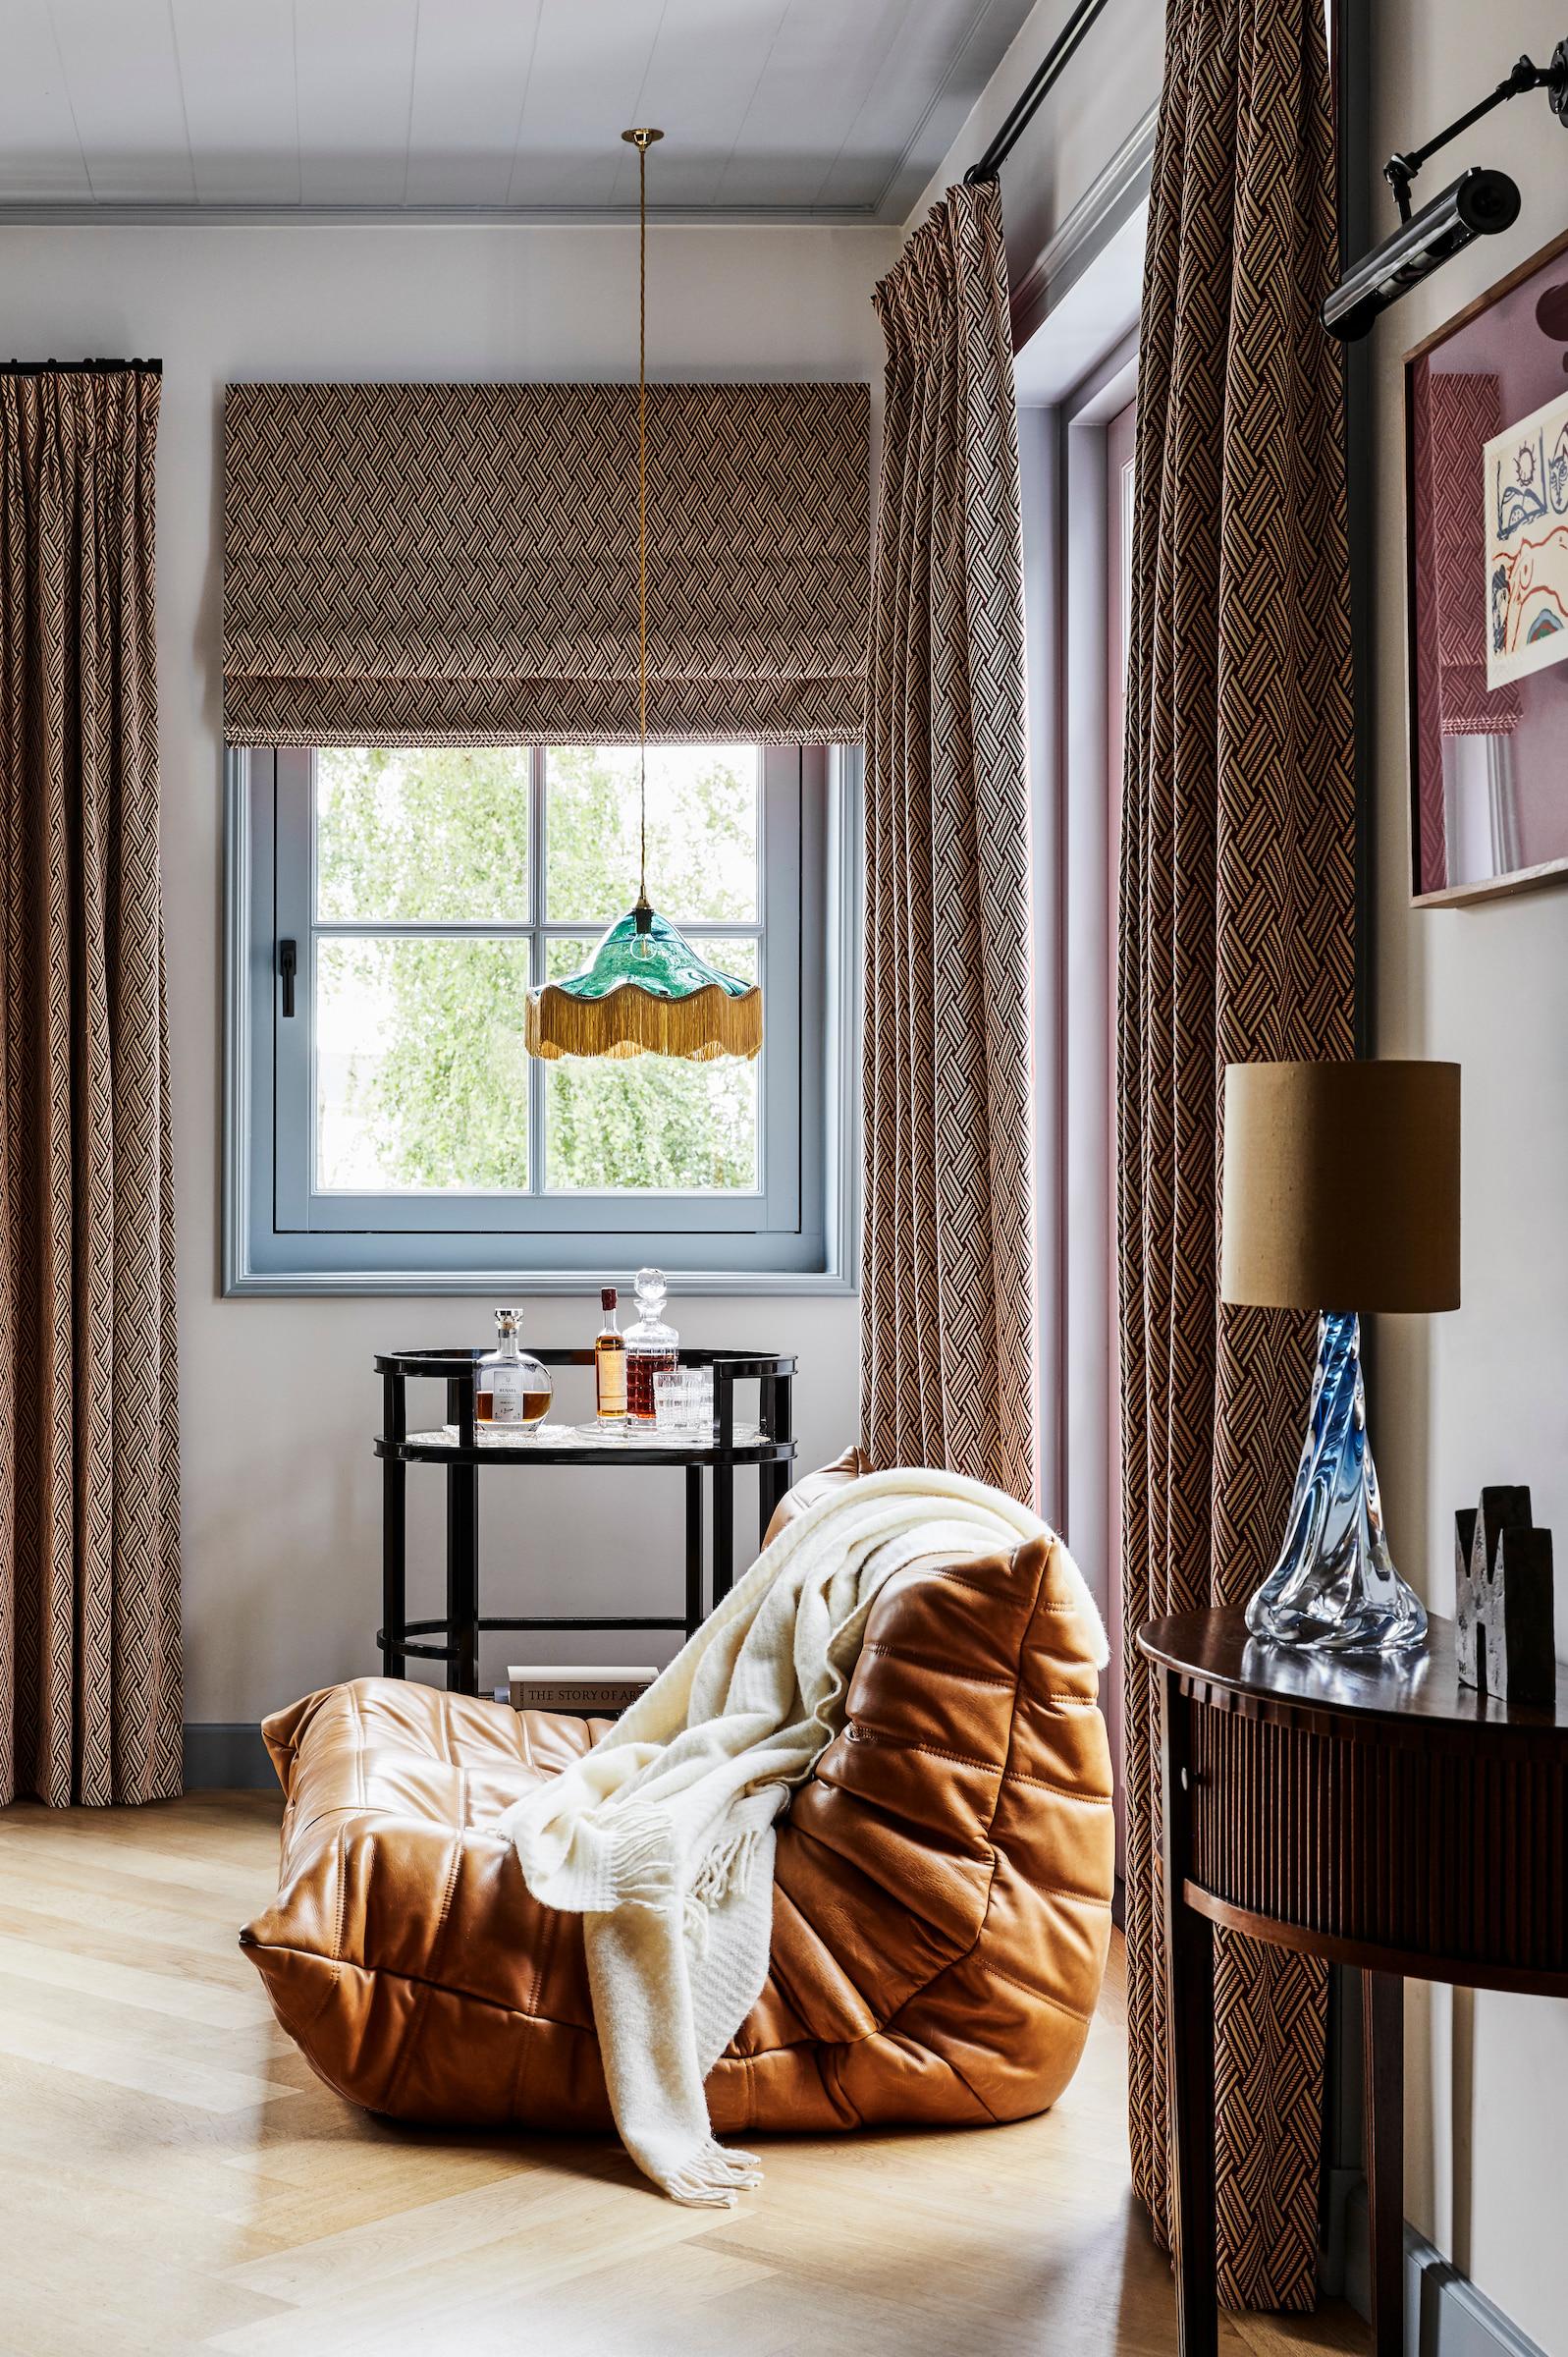 Luxury apartment interior design by Buro Kif